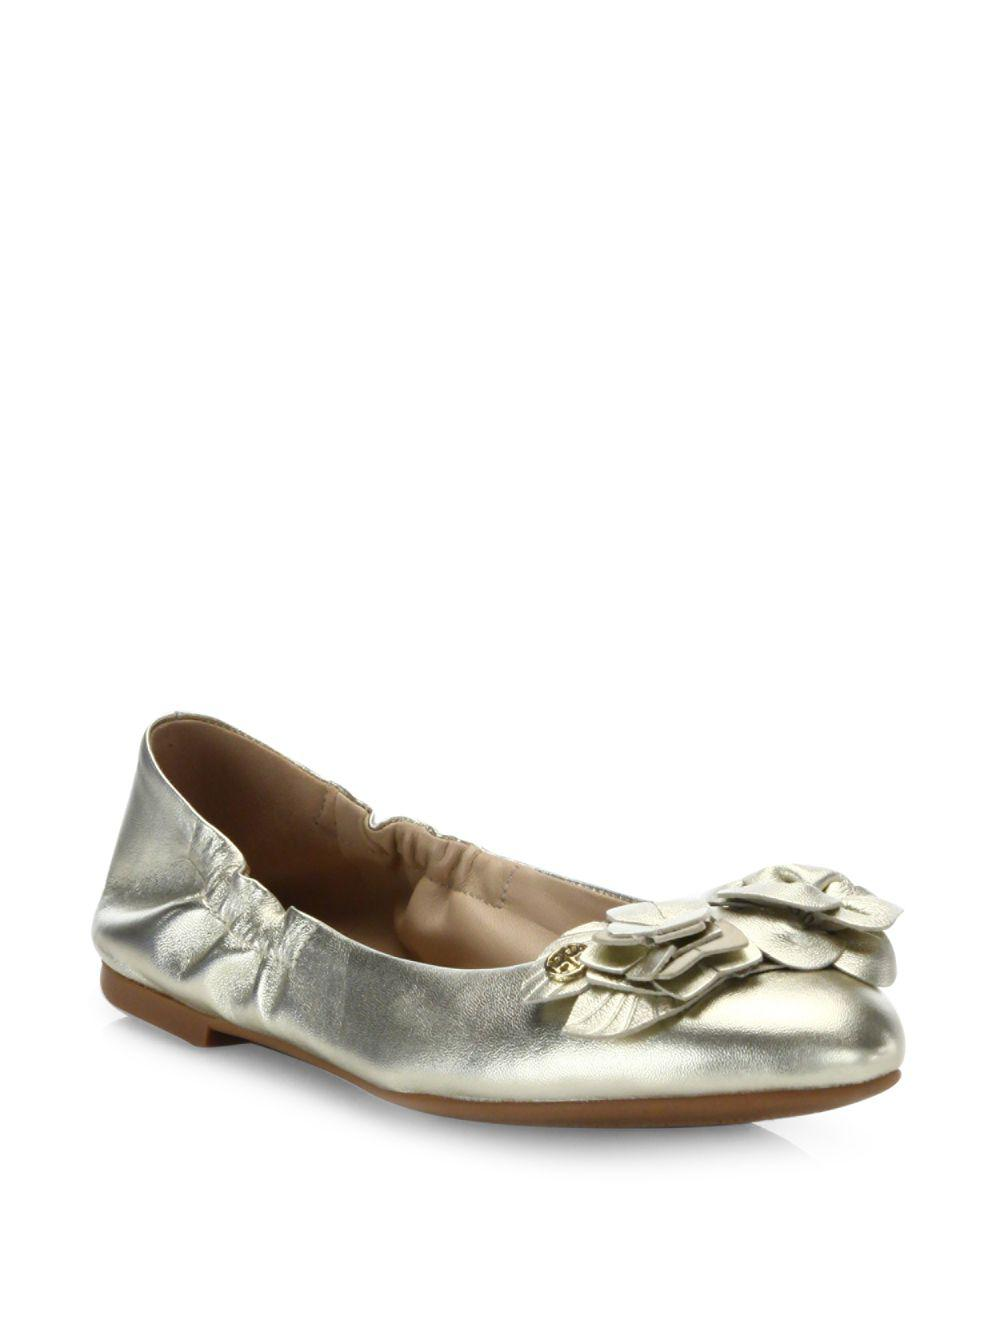 bdb3e9a1430 Lyst - Tory Burch Blossom Metallic Leather Ballet Flats in Metallic